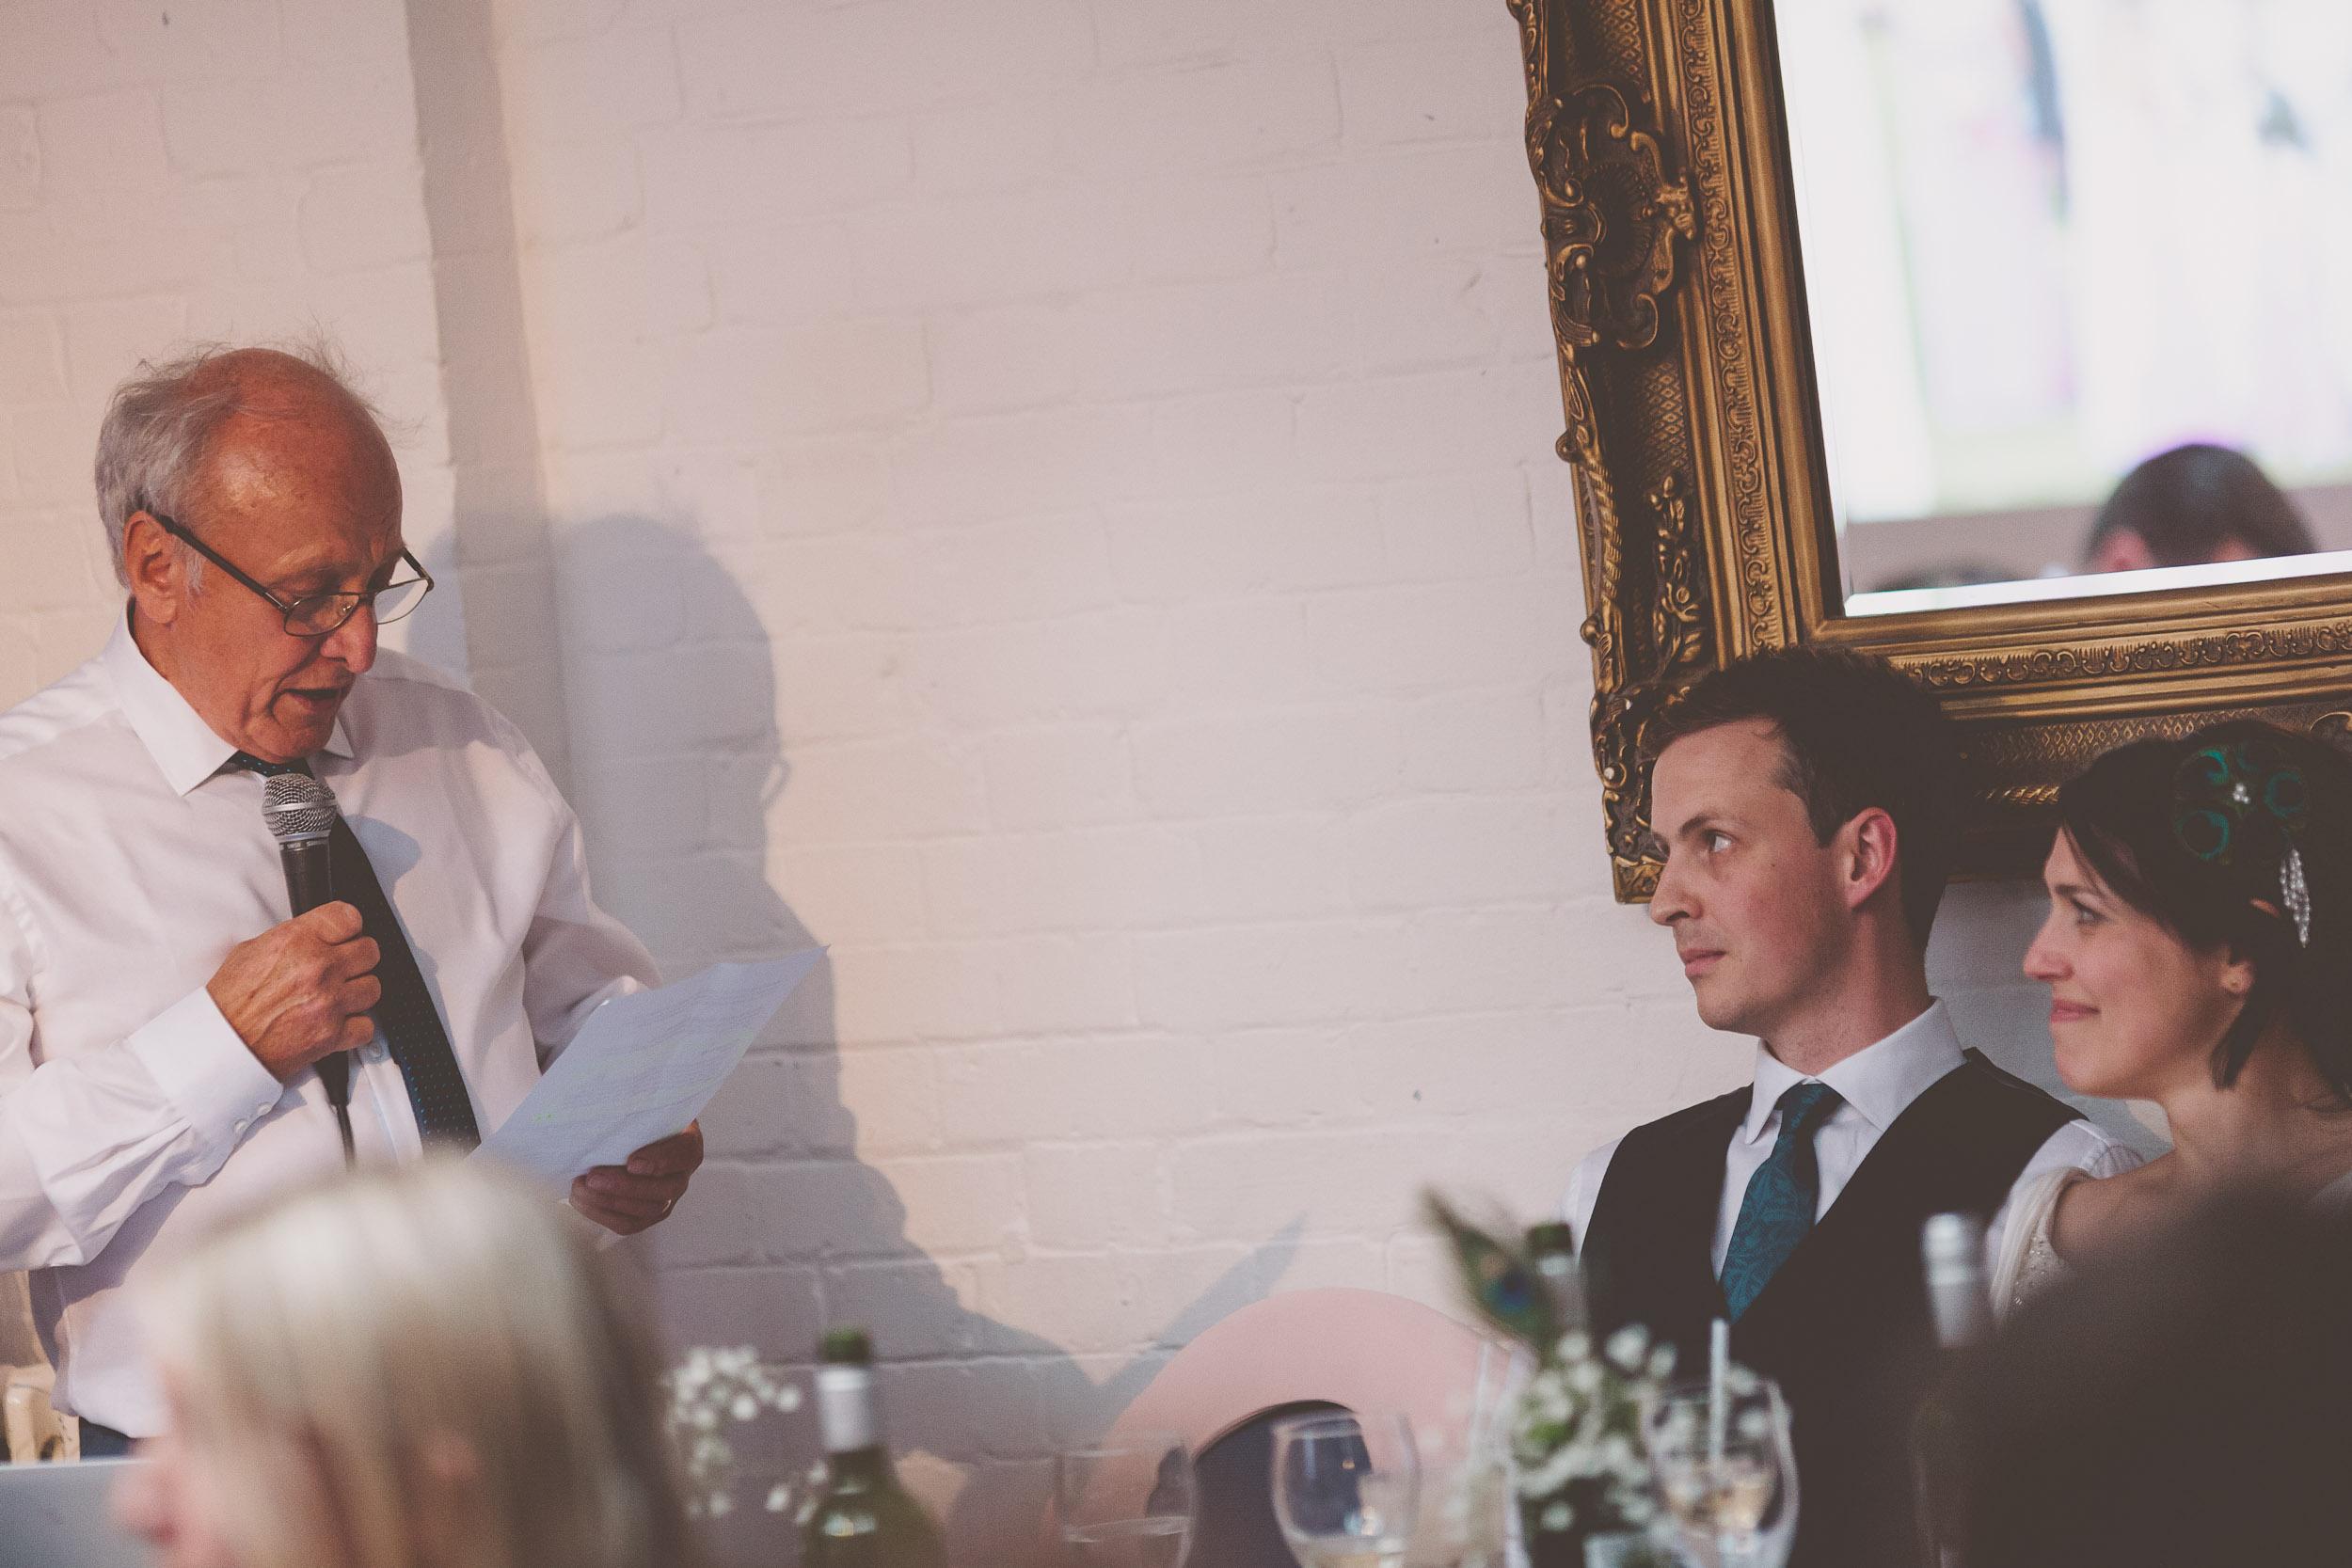 islington-town-hall-4th-floor-studios-wedding369.jpg